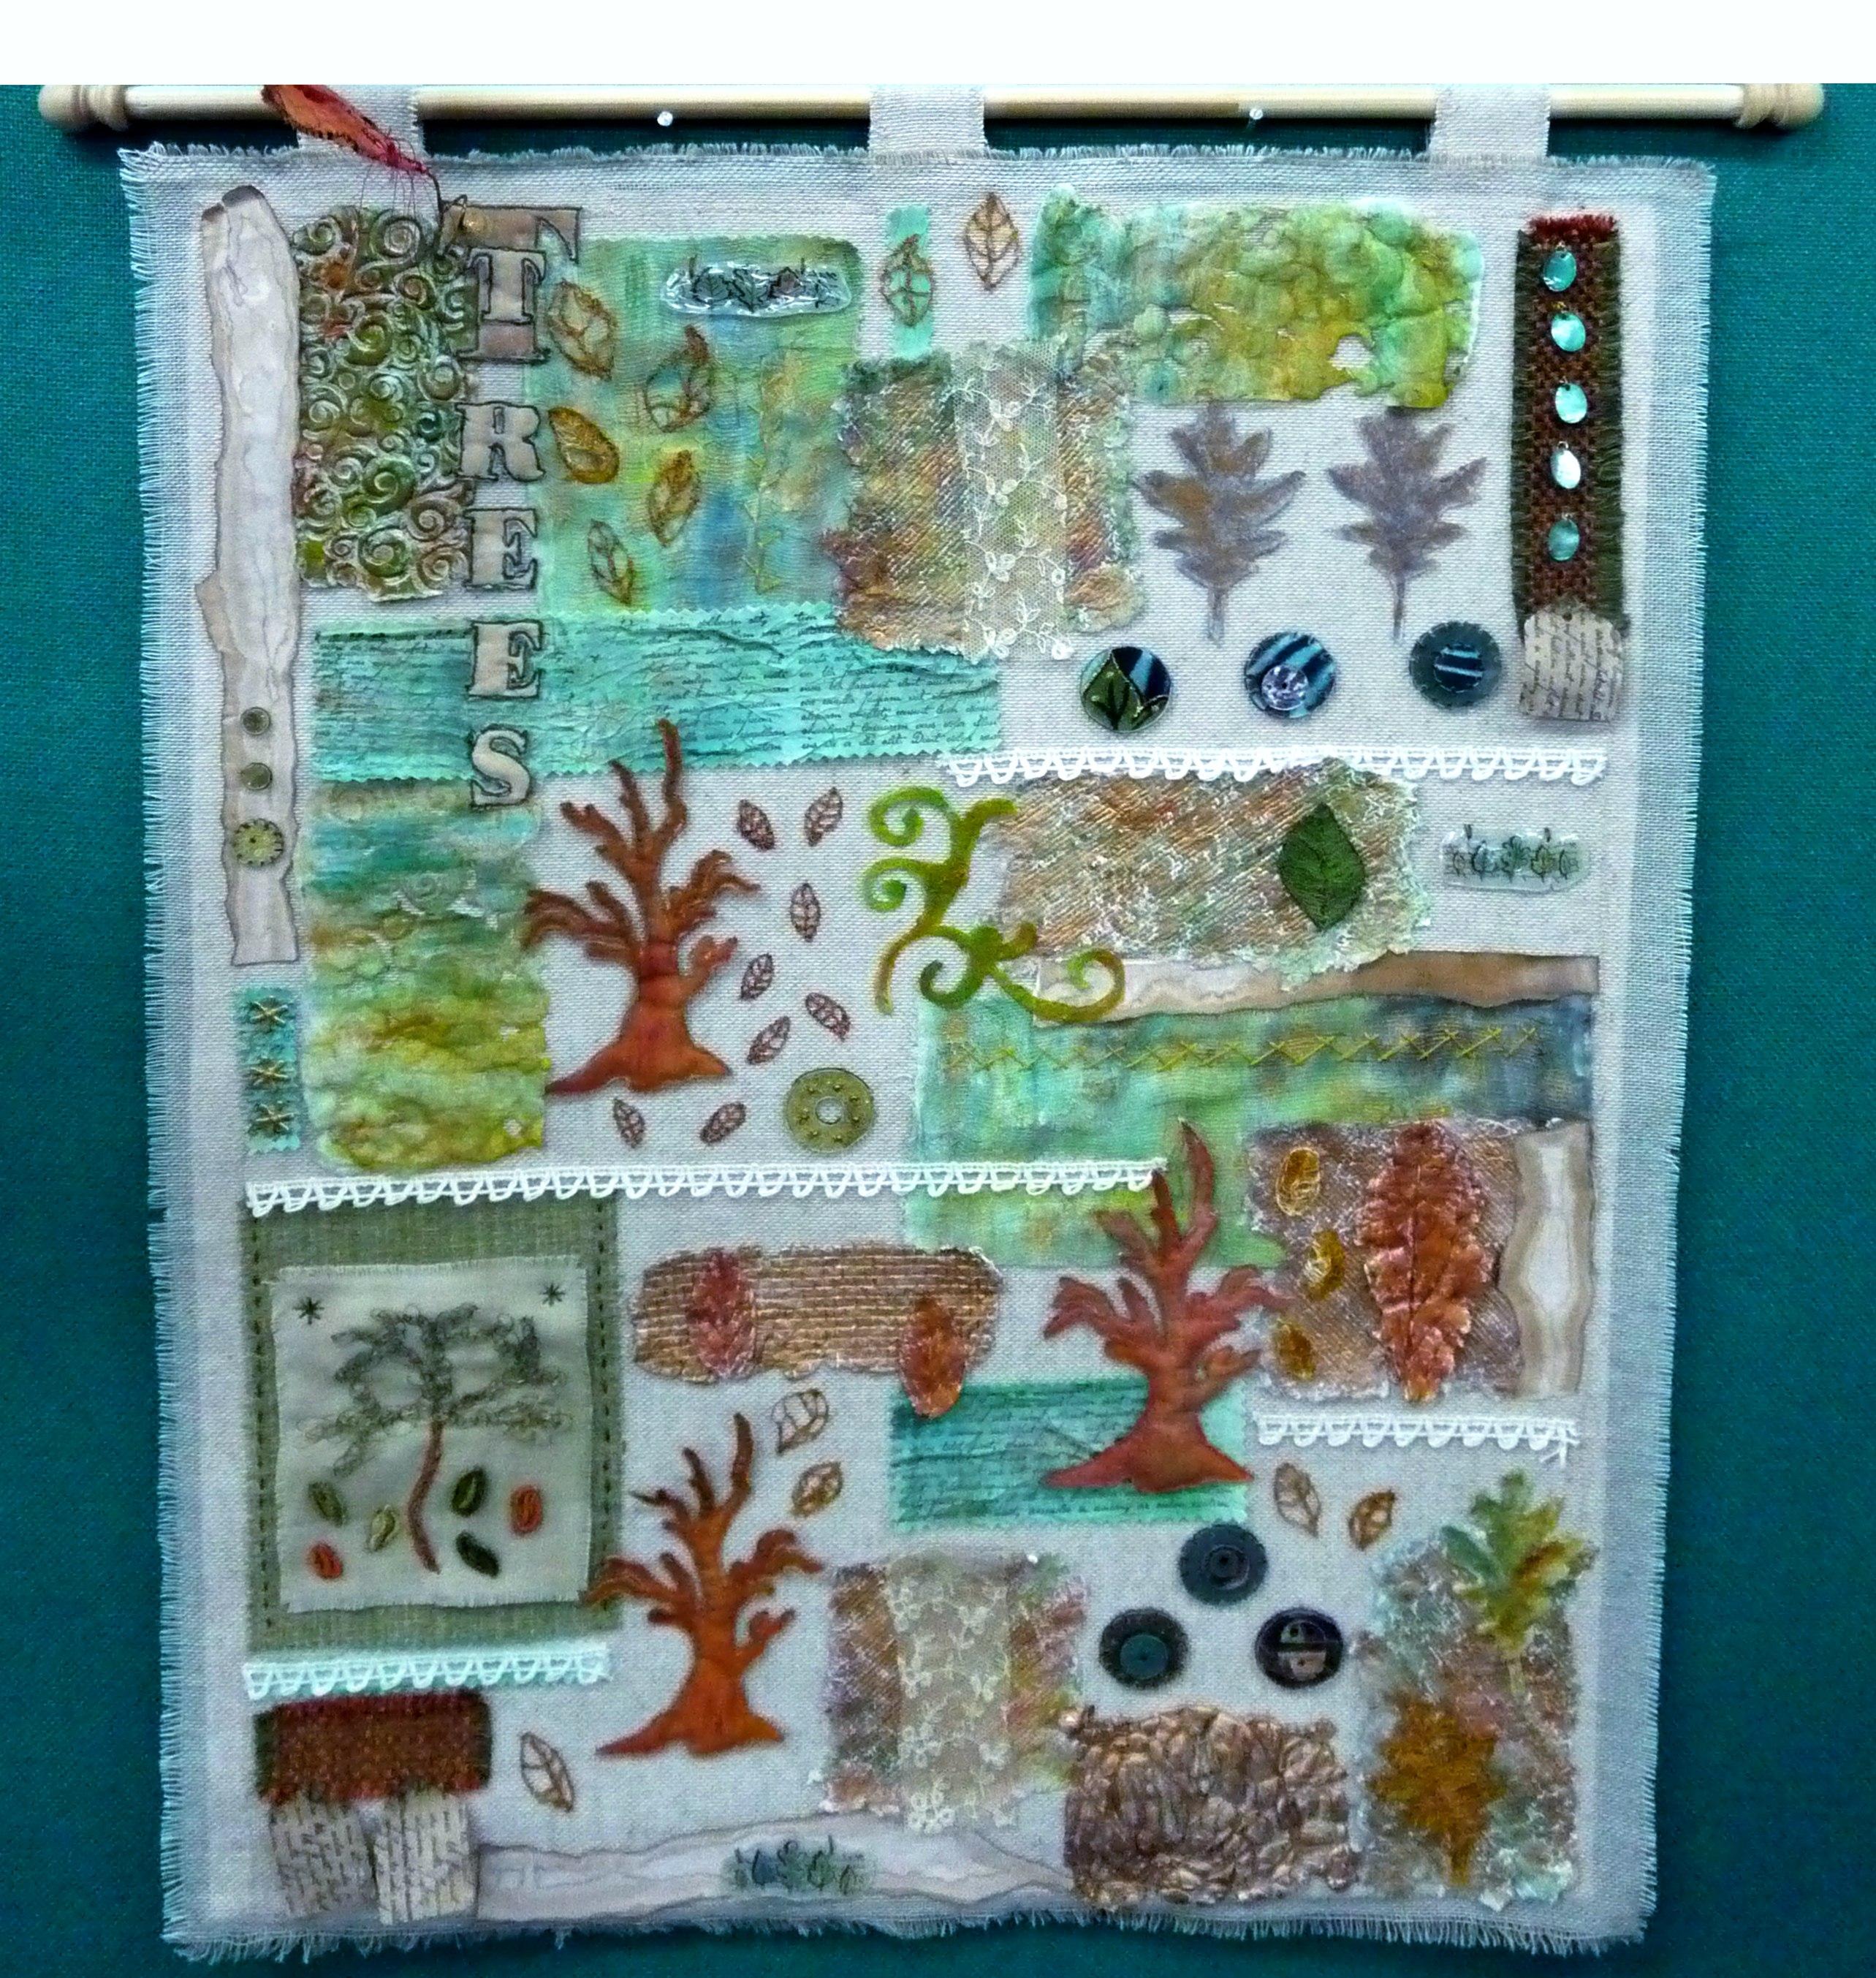 embroidery by Bridget Newbold